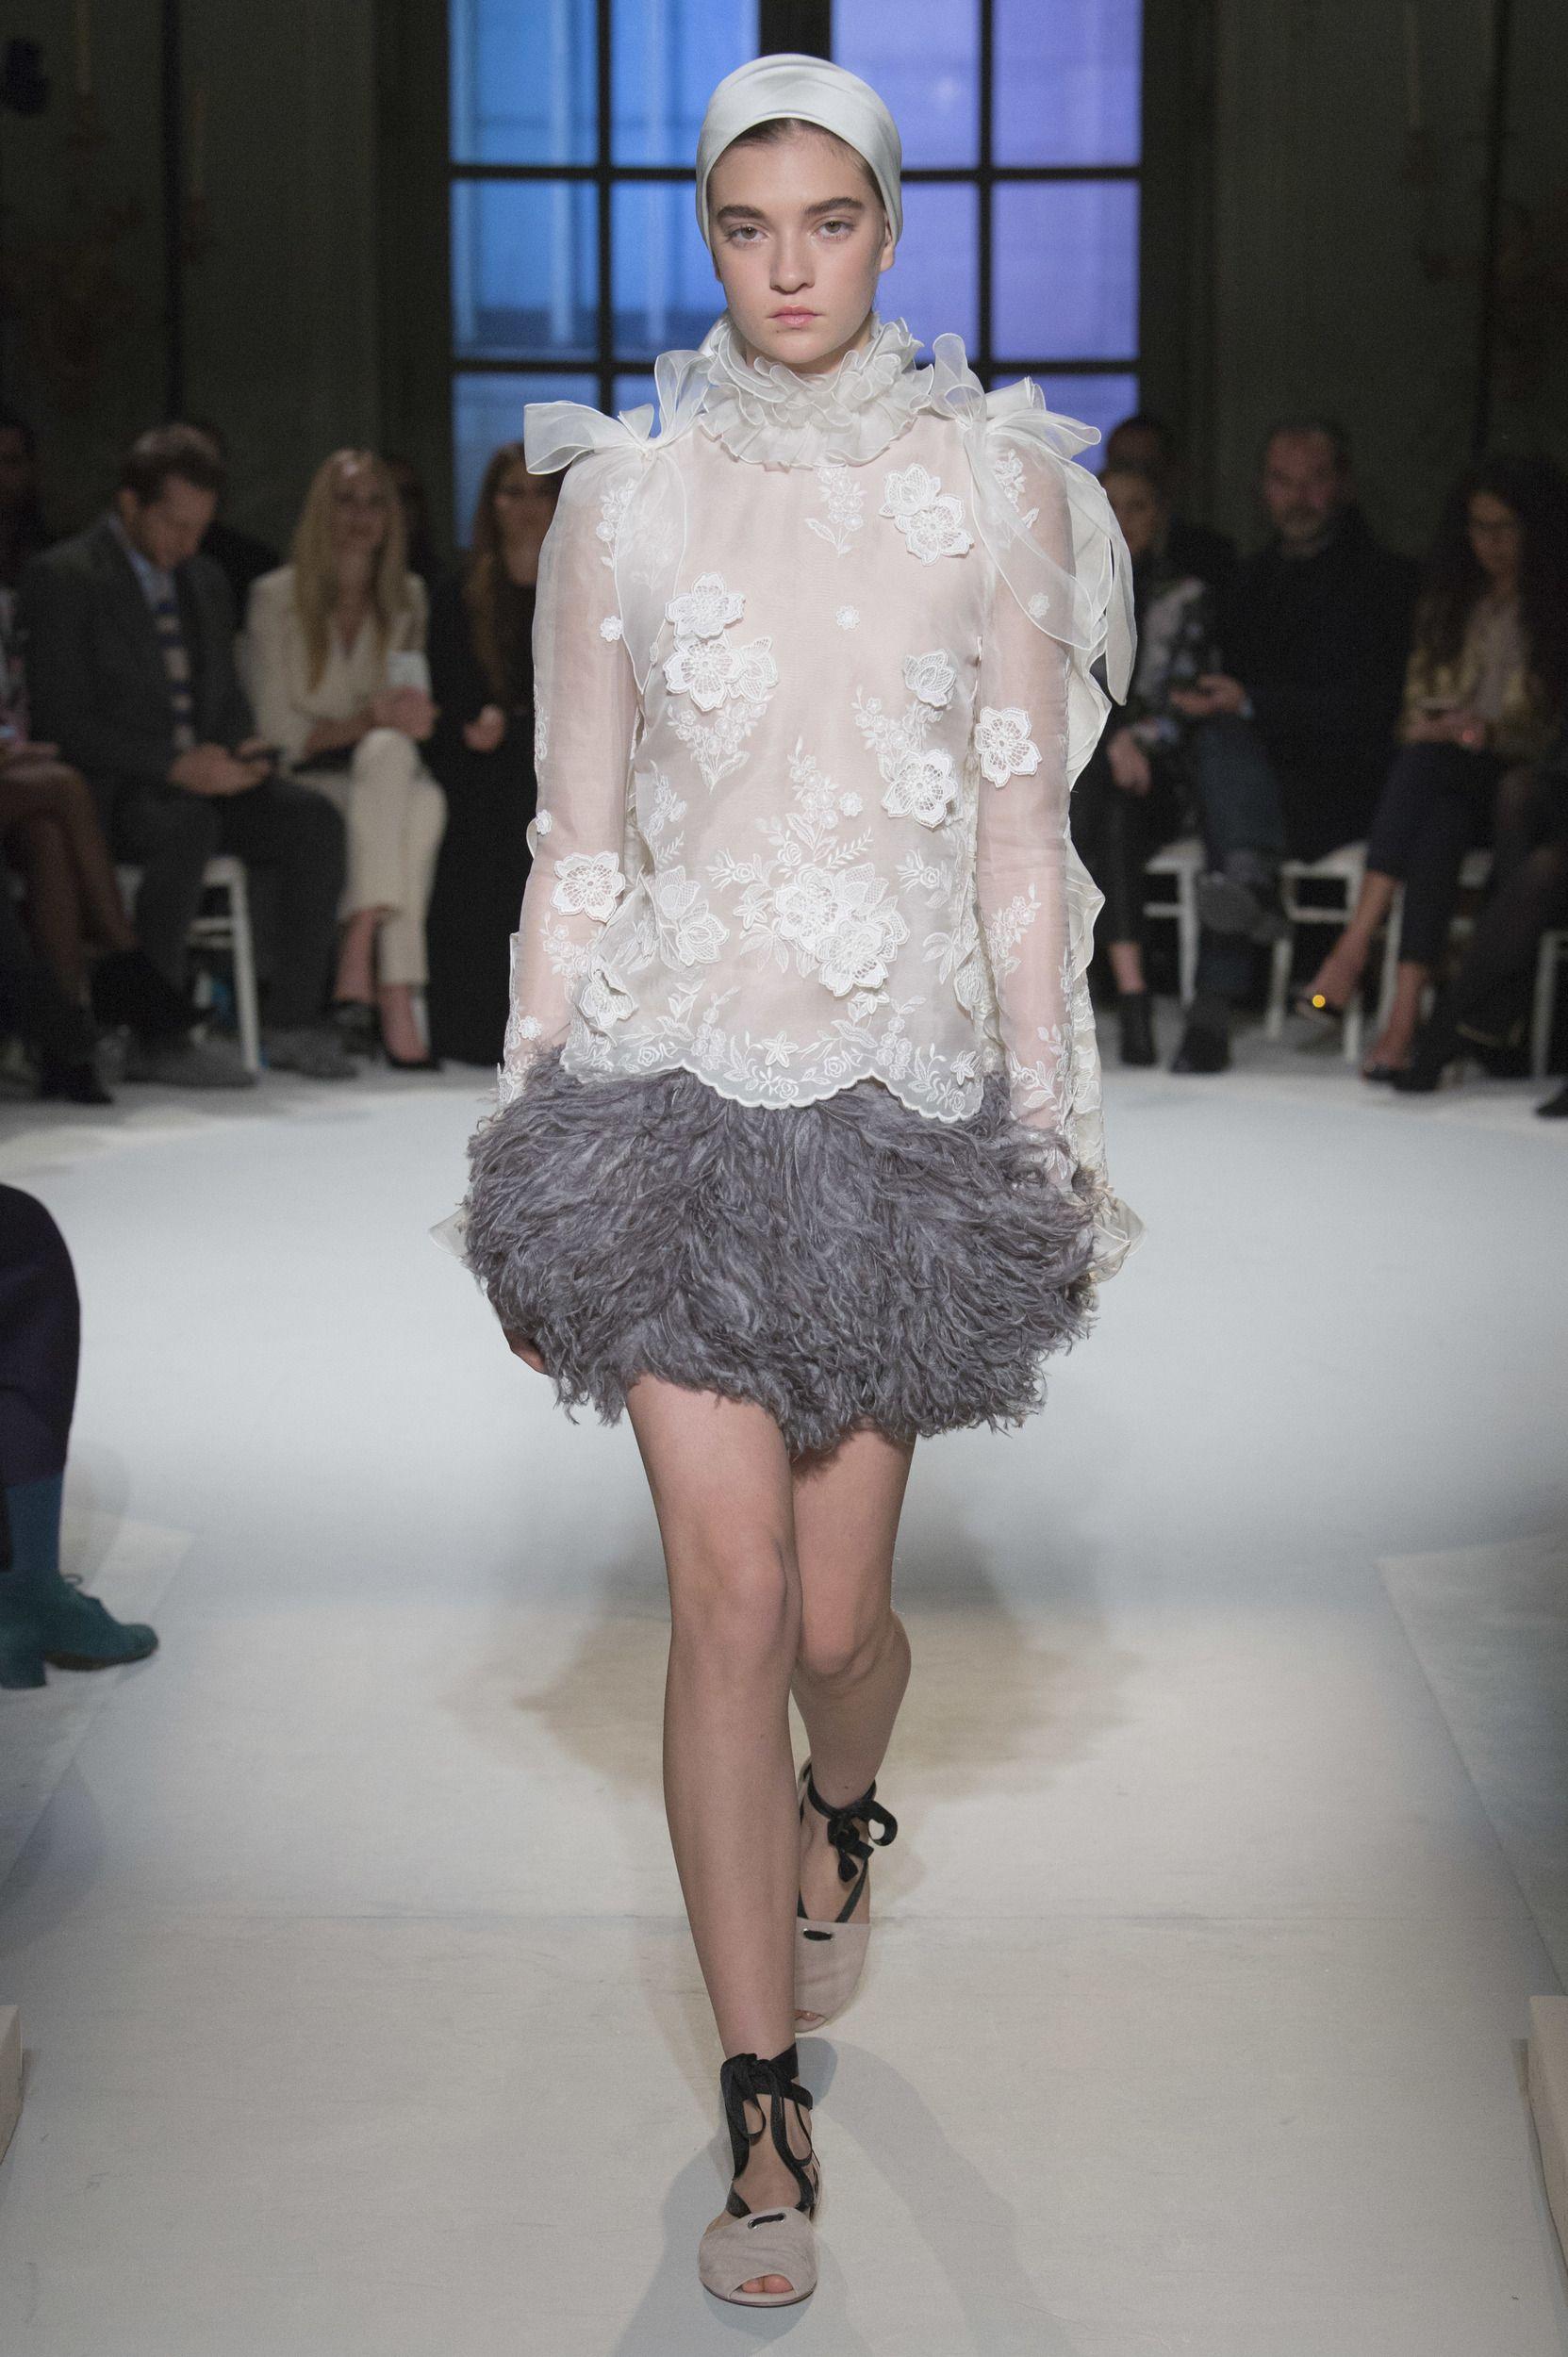 Giamattista Valli Haute Couture Spring 2017 Photo: Courtesy  via @AOL_Lifestyle Read more: https://www.aol.com/article/lifestyle/2017/01/25/ralph-and-russo-a-mystical-transformation/21662914/?a_dgi=aolshare_pinterest#fullscreen